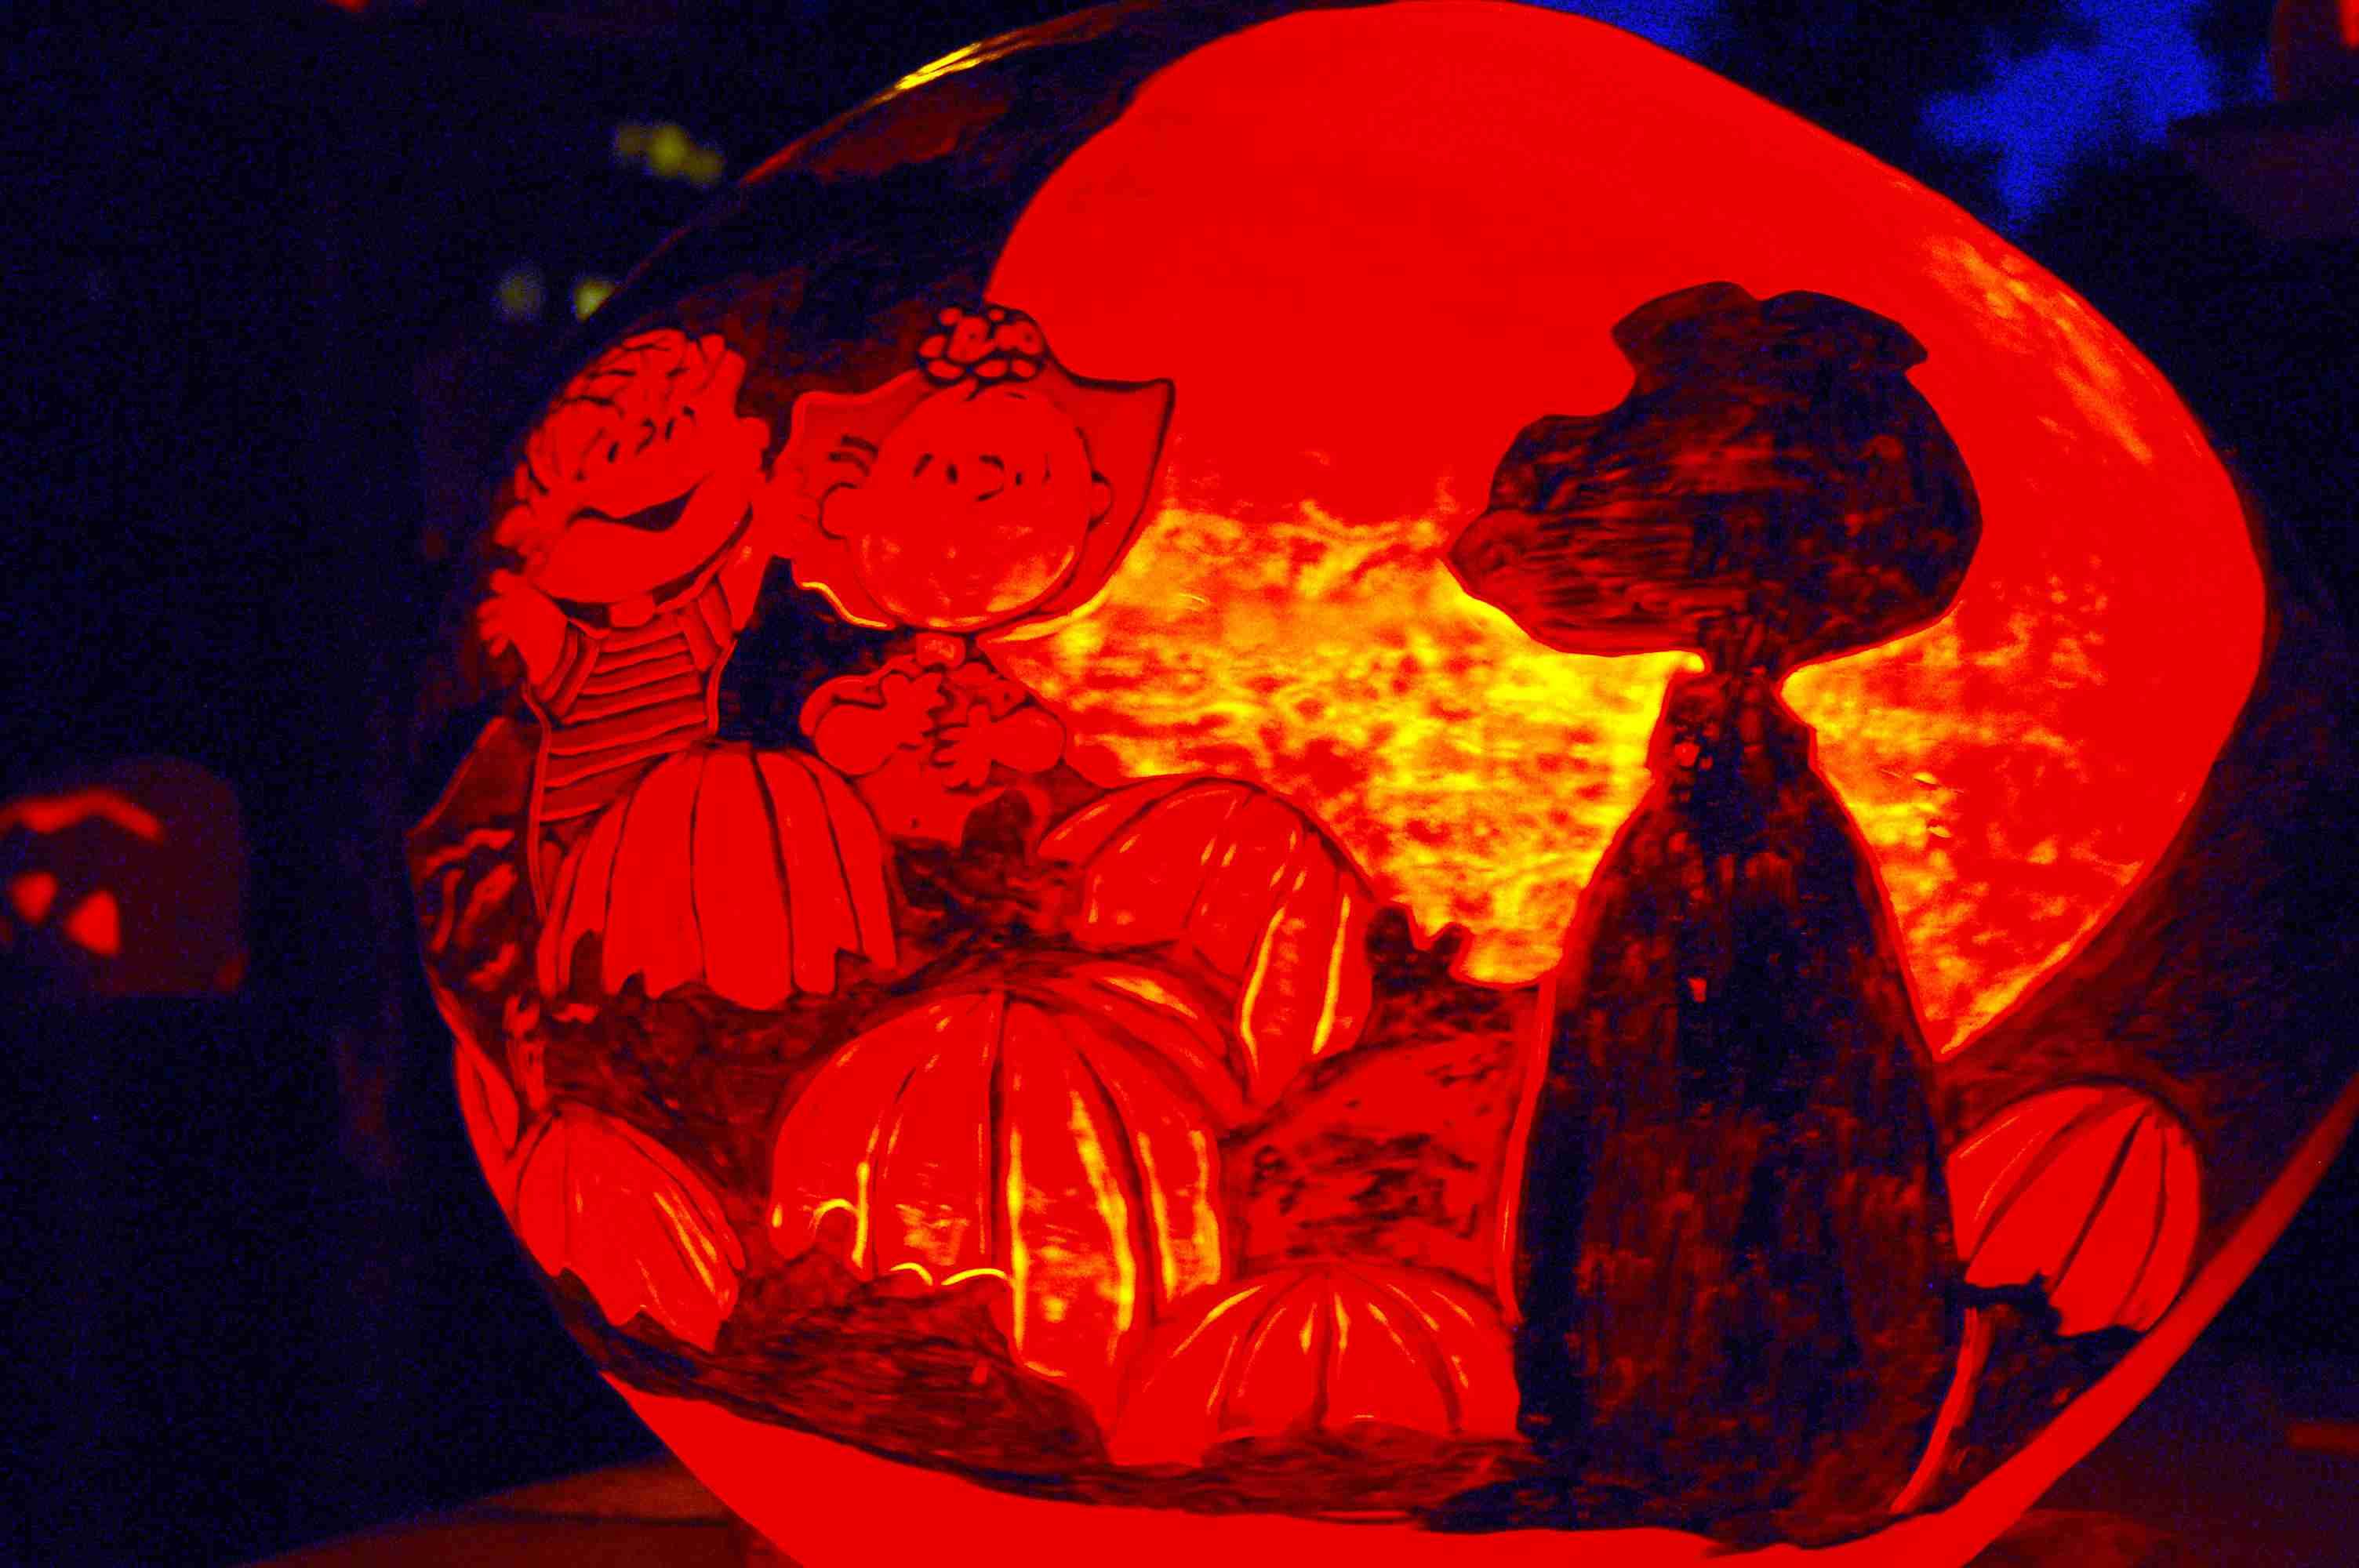 Jack O Lantern Spectacular in Providence Rhode Island